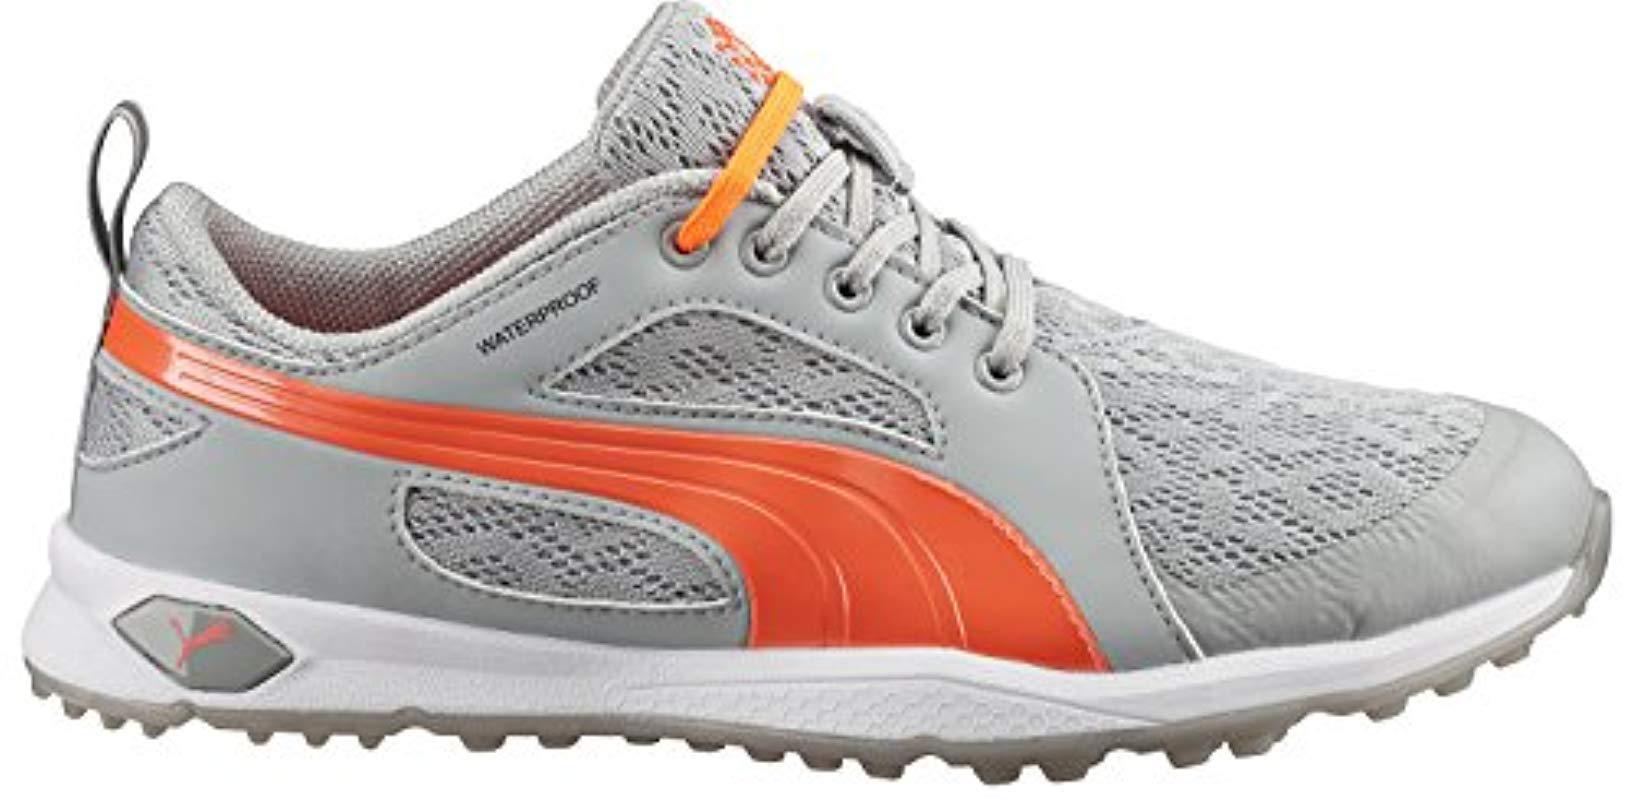 6114d43eae3c Lyst - Puma Biofly Mesh Wmns Golf Shoe in Gray